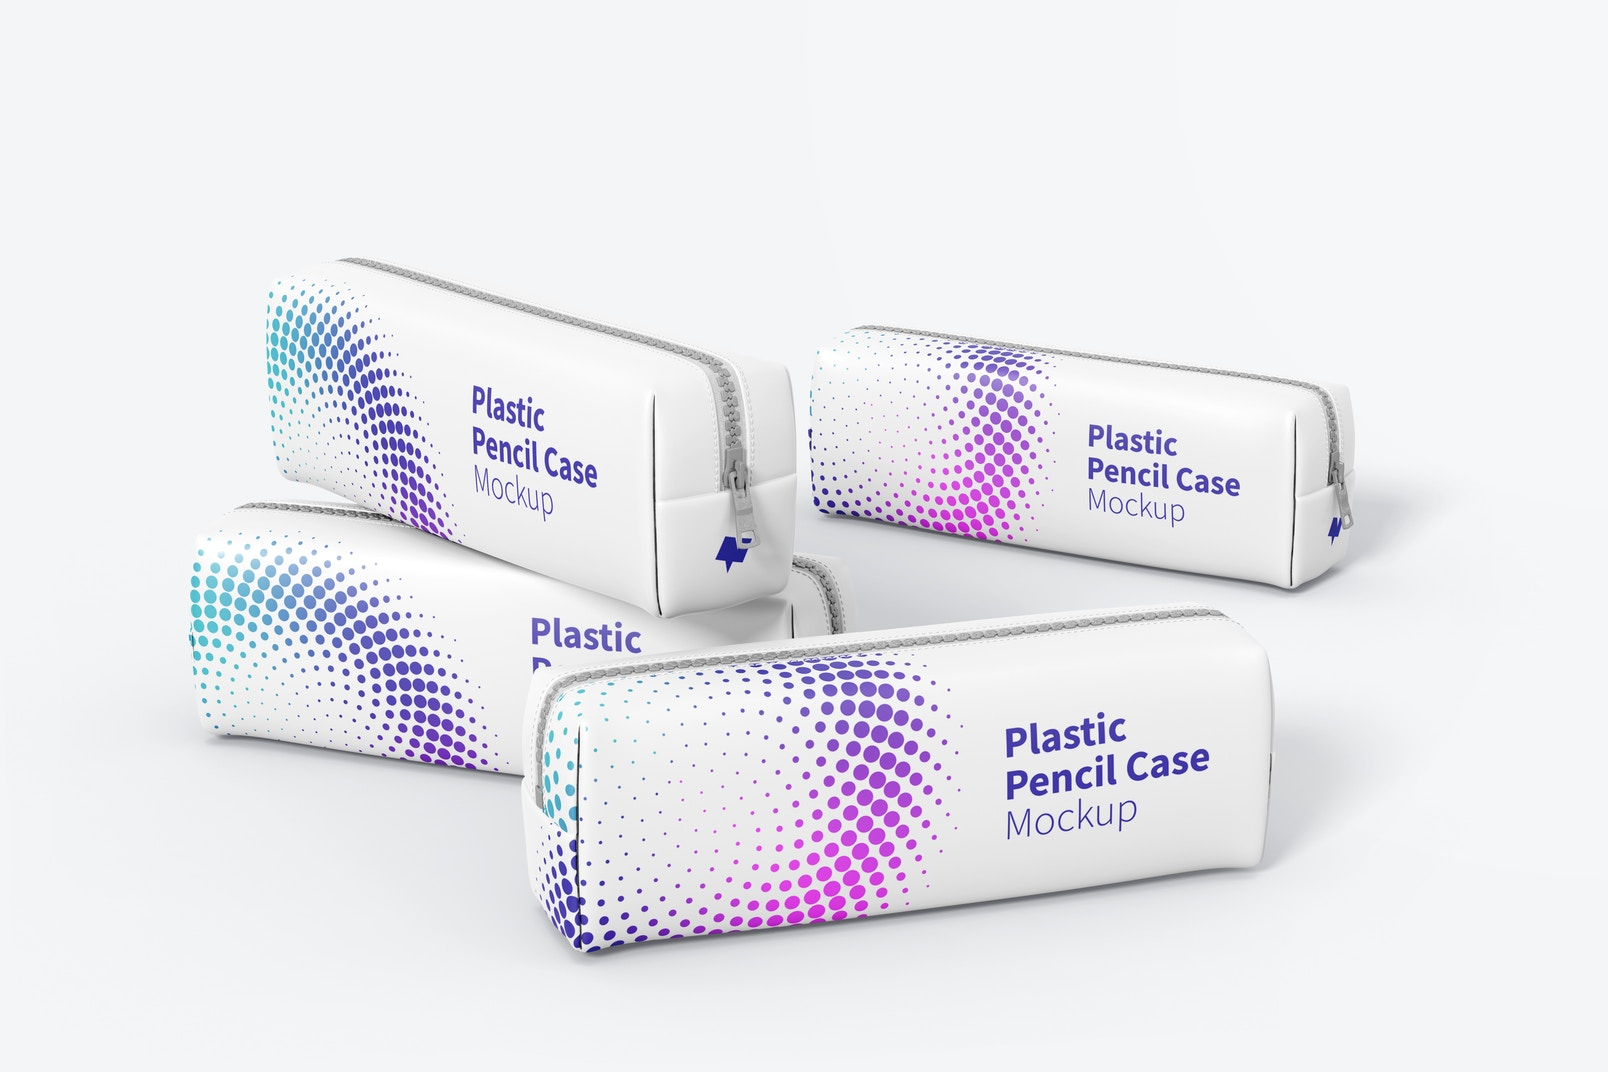 Maqueta de Juego de Estuche Plástico para Lápices